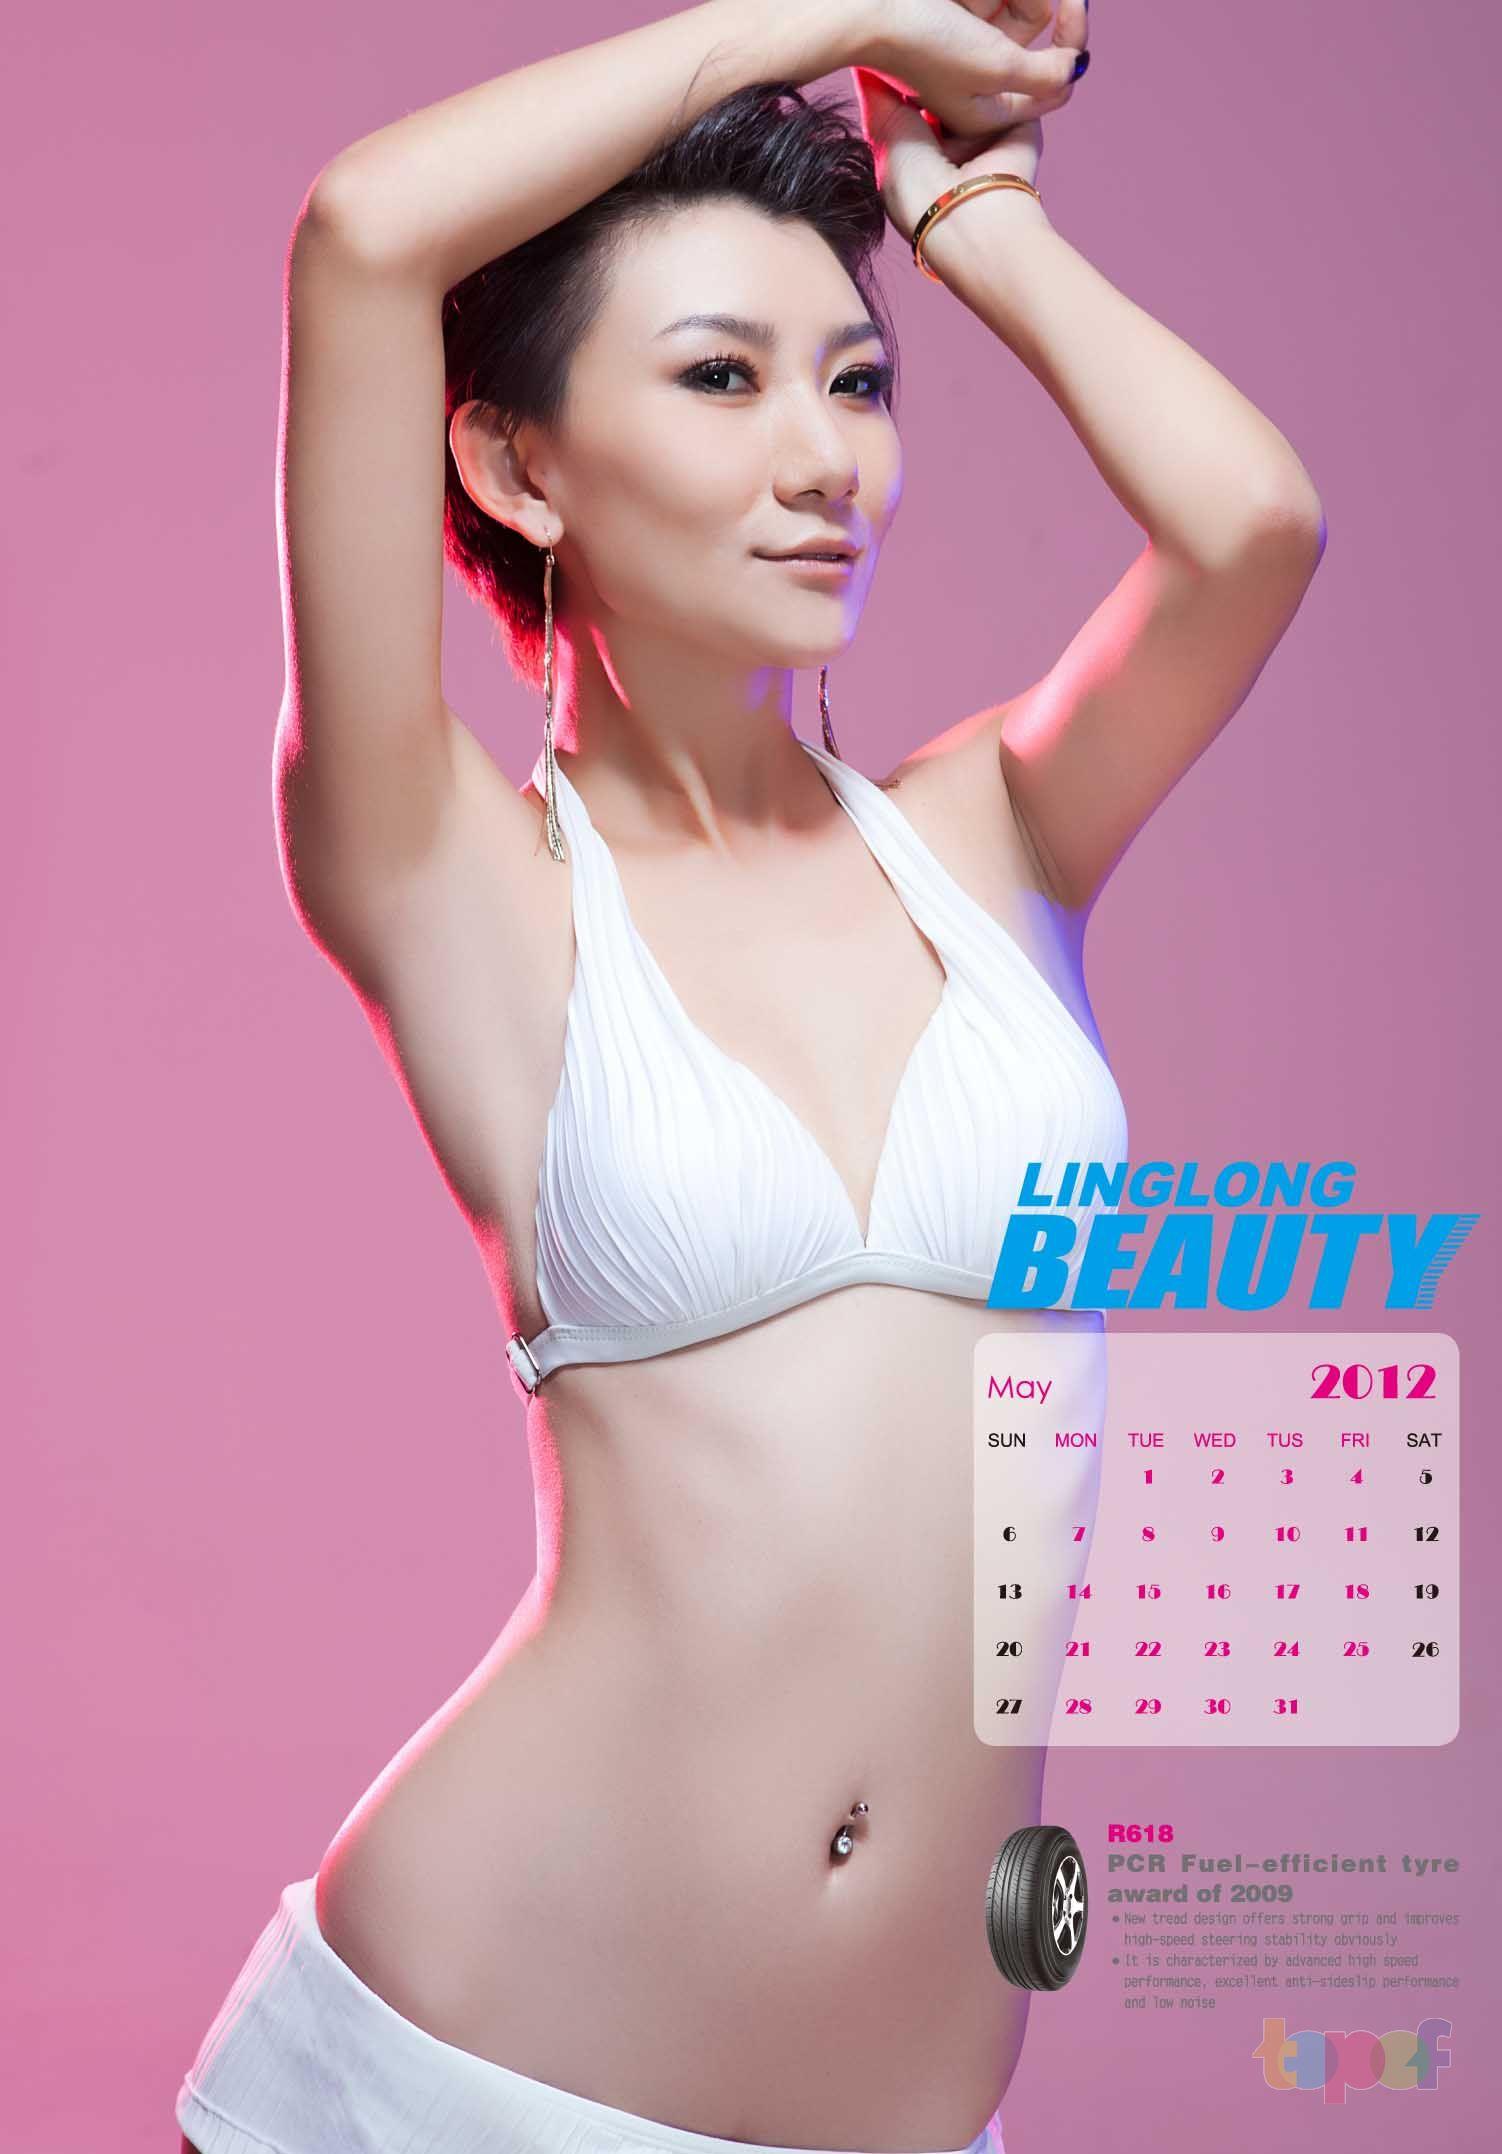 Календари от LingLong (Шины). Май 2012 года